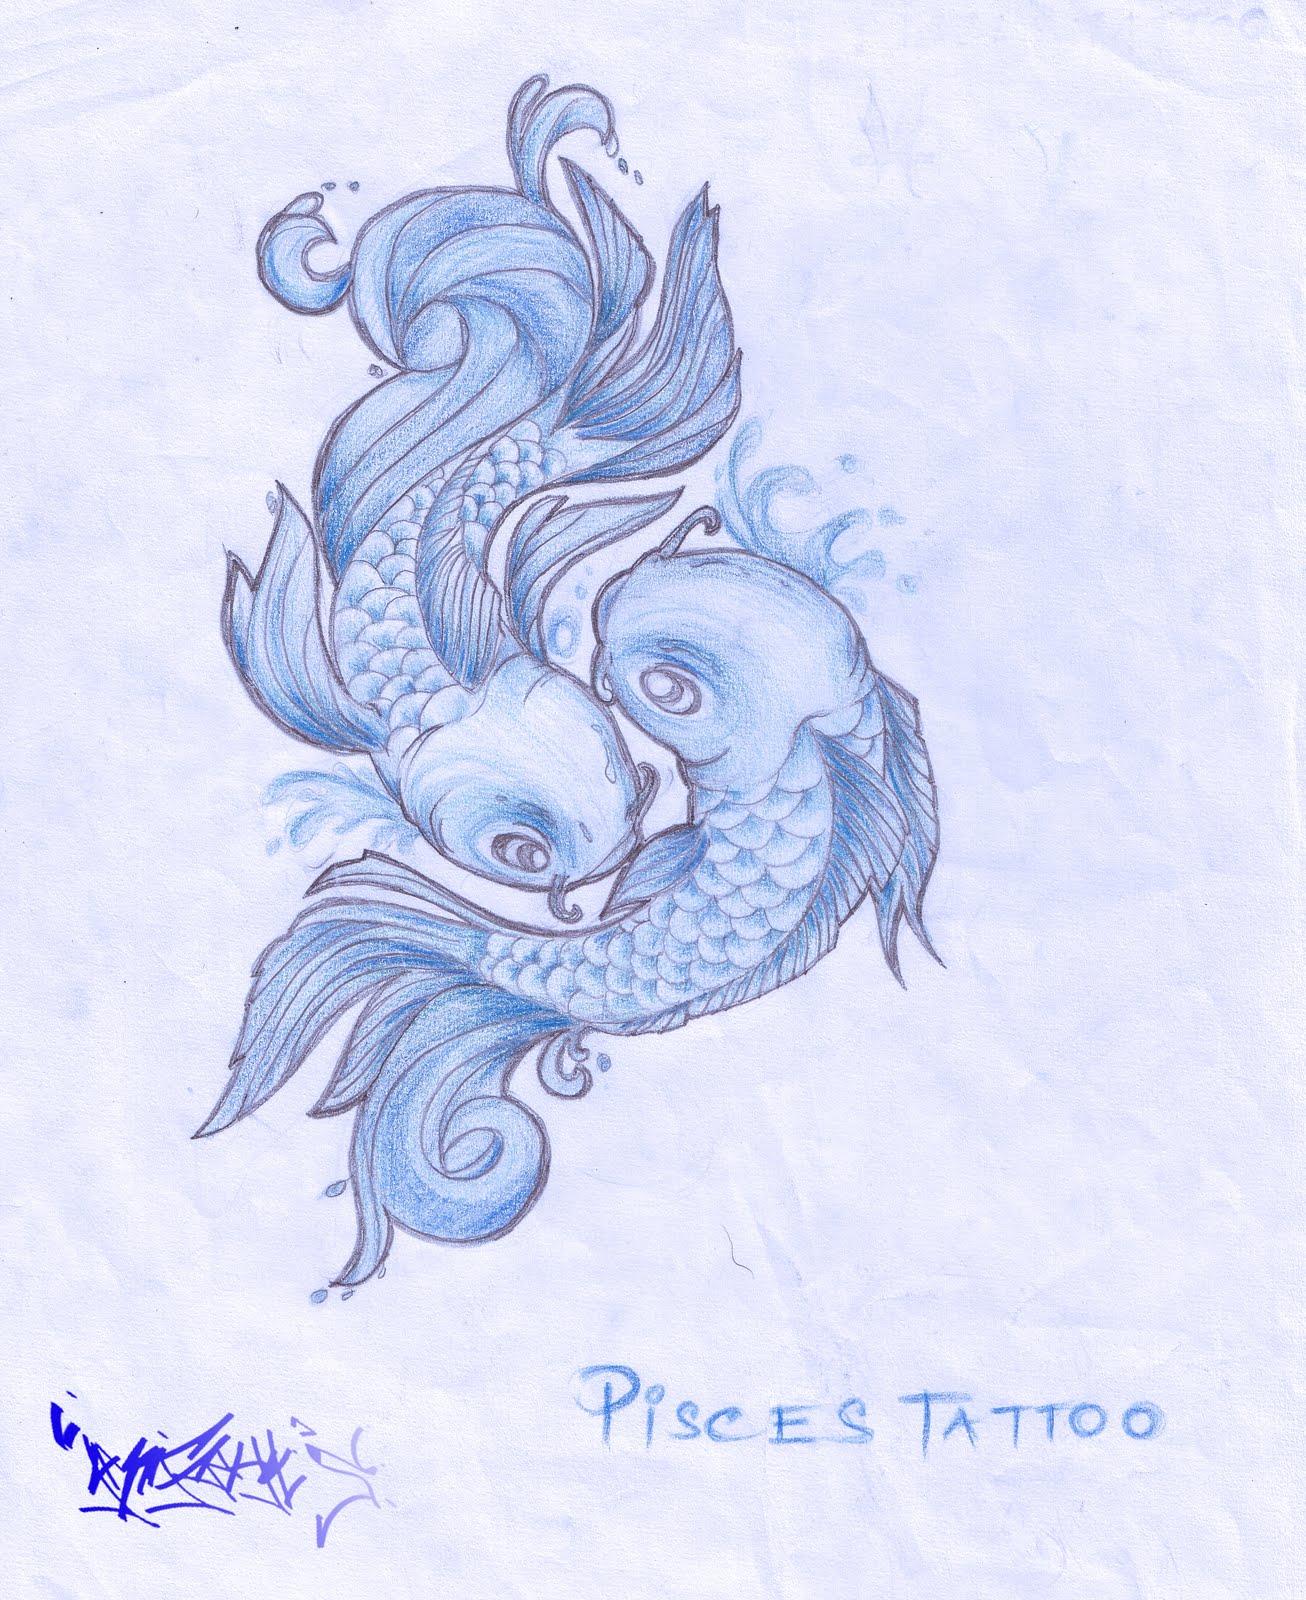 concept_Pisces tattoo